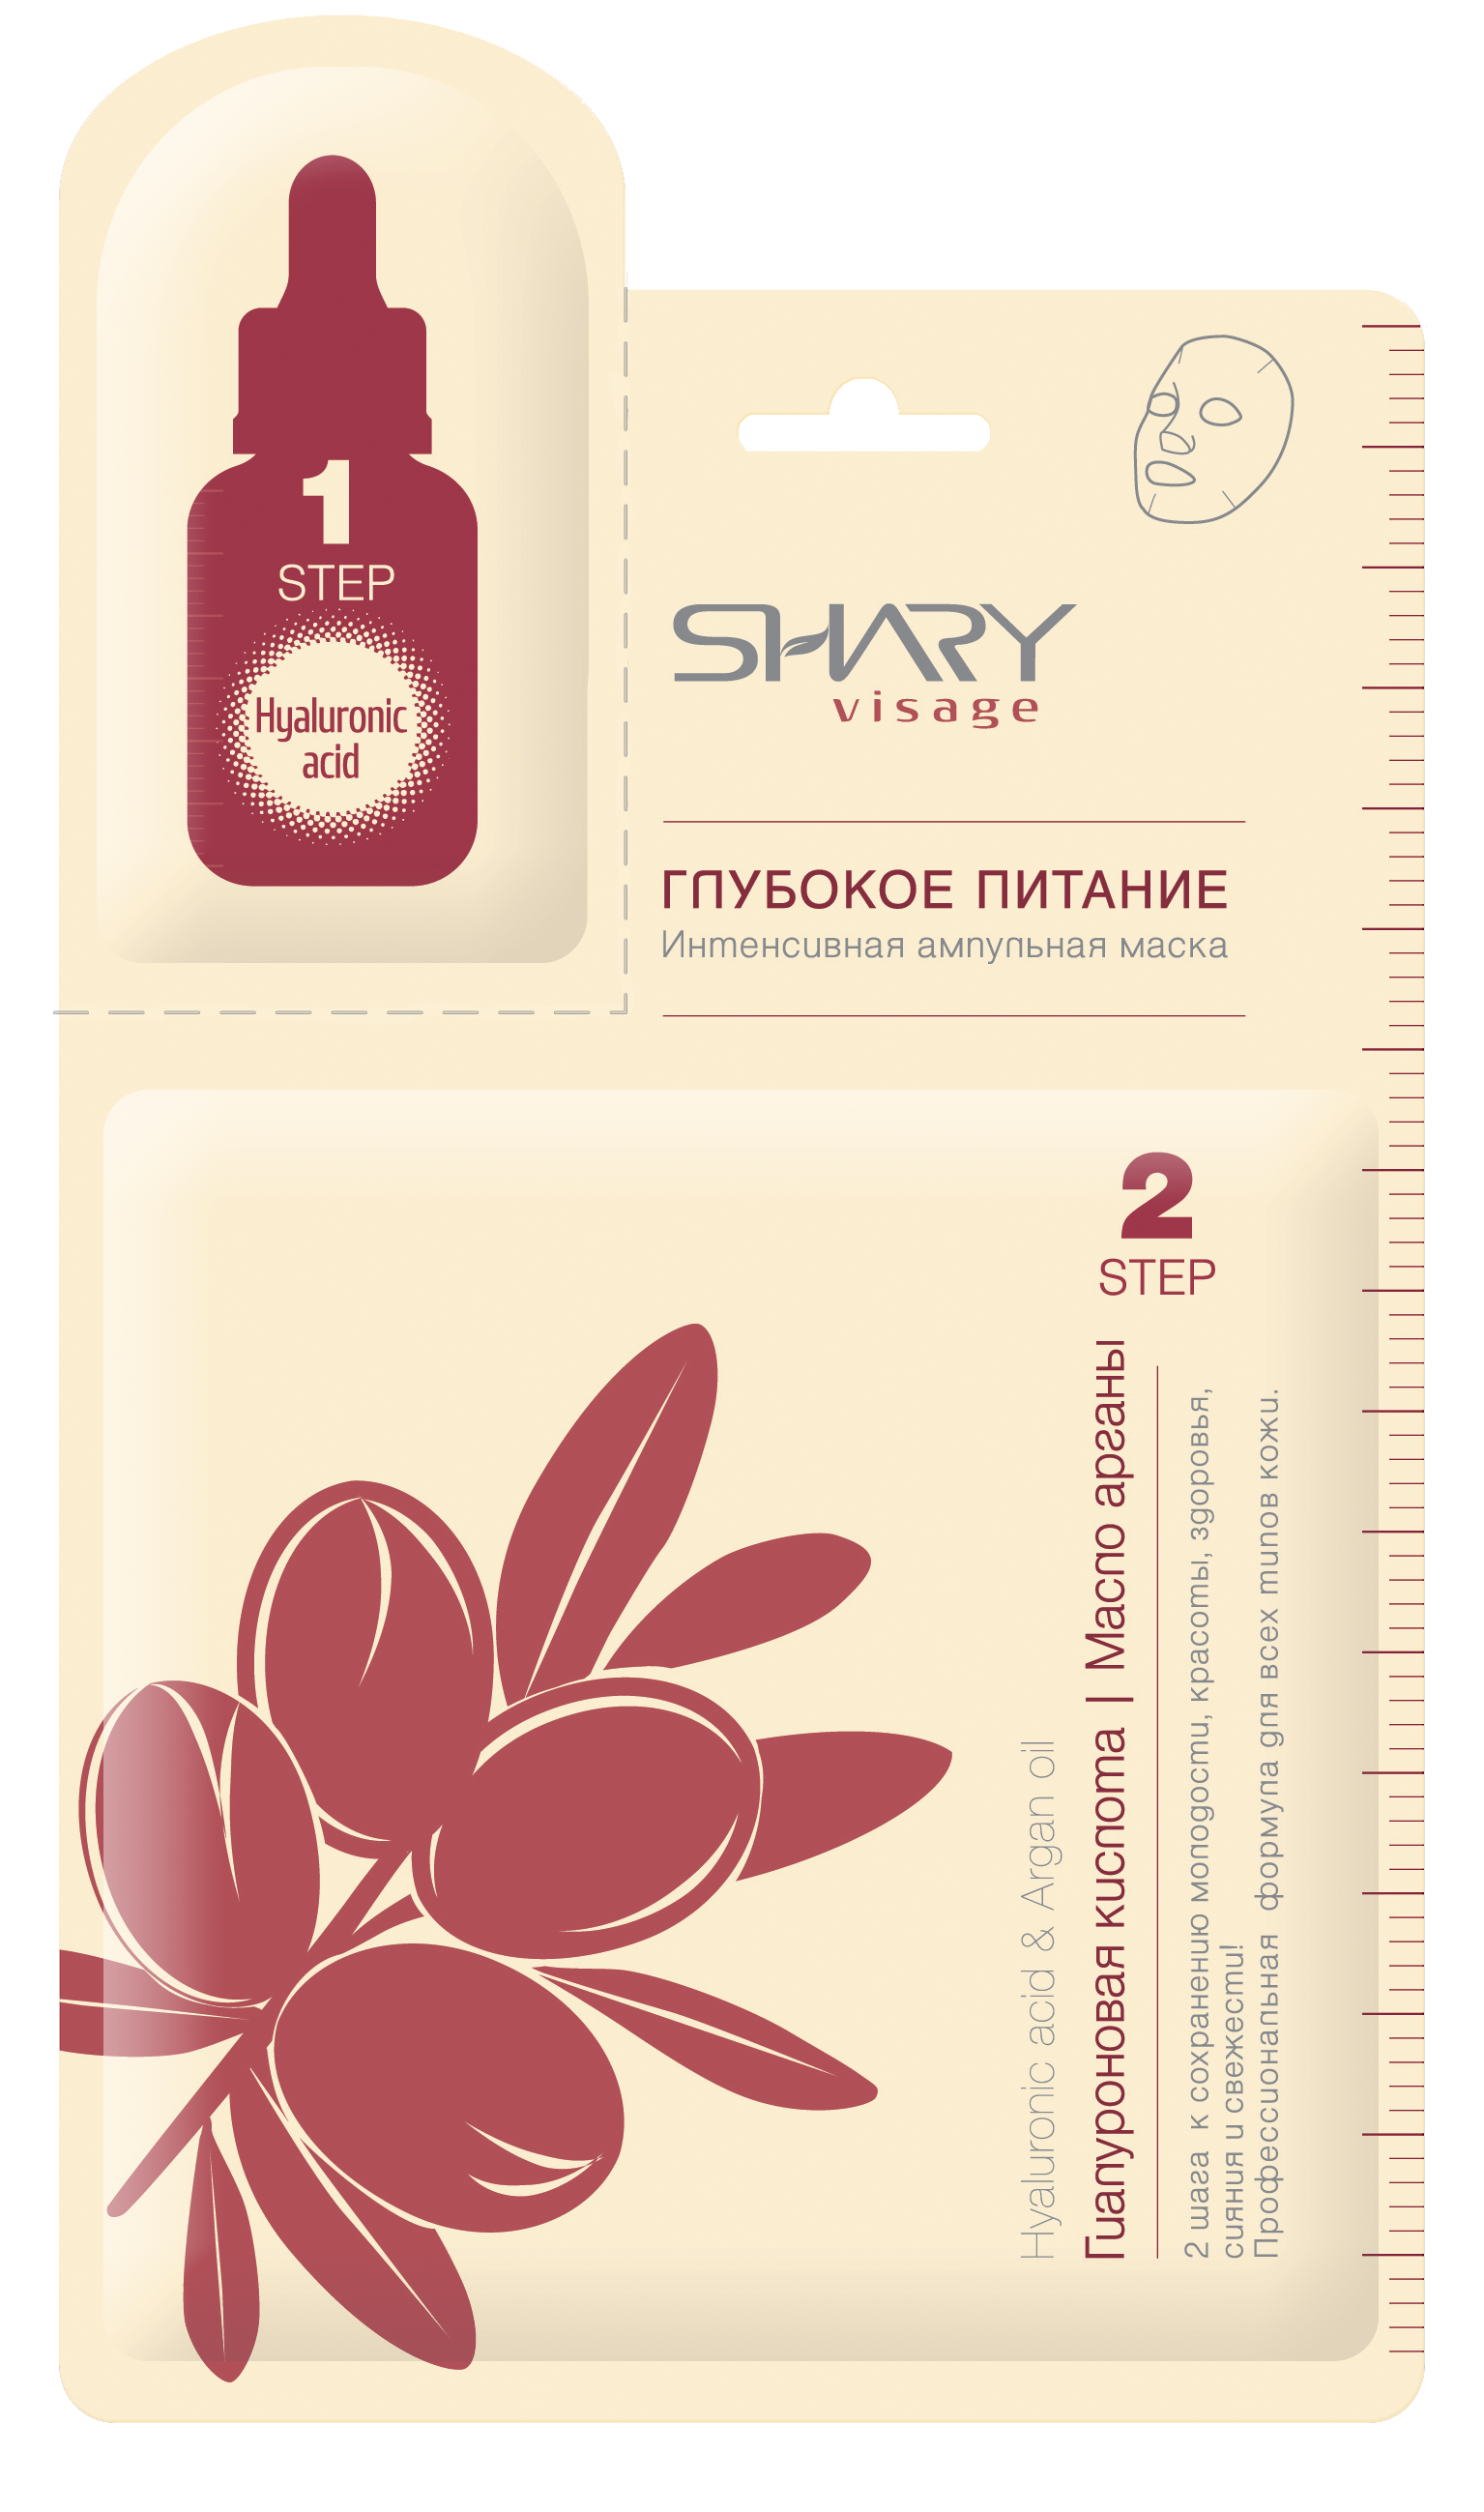 SHARY Маска интенсивная ампульная, глубокое питание, Масло арганы для лица / SHARY VISAGE 23 гр